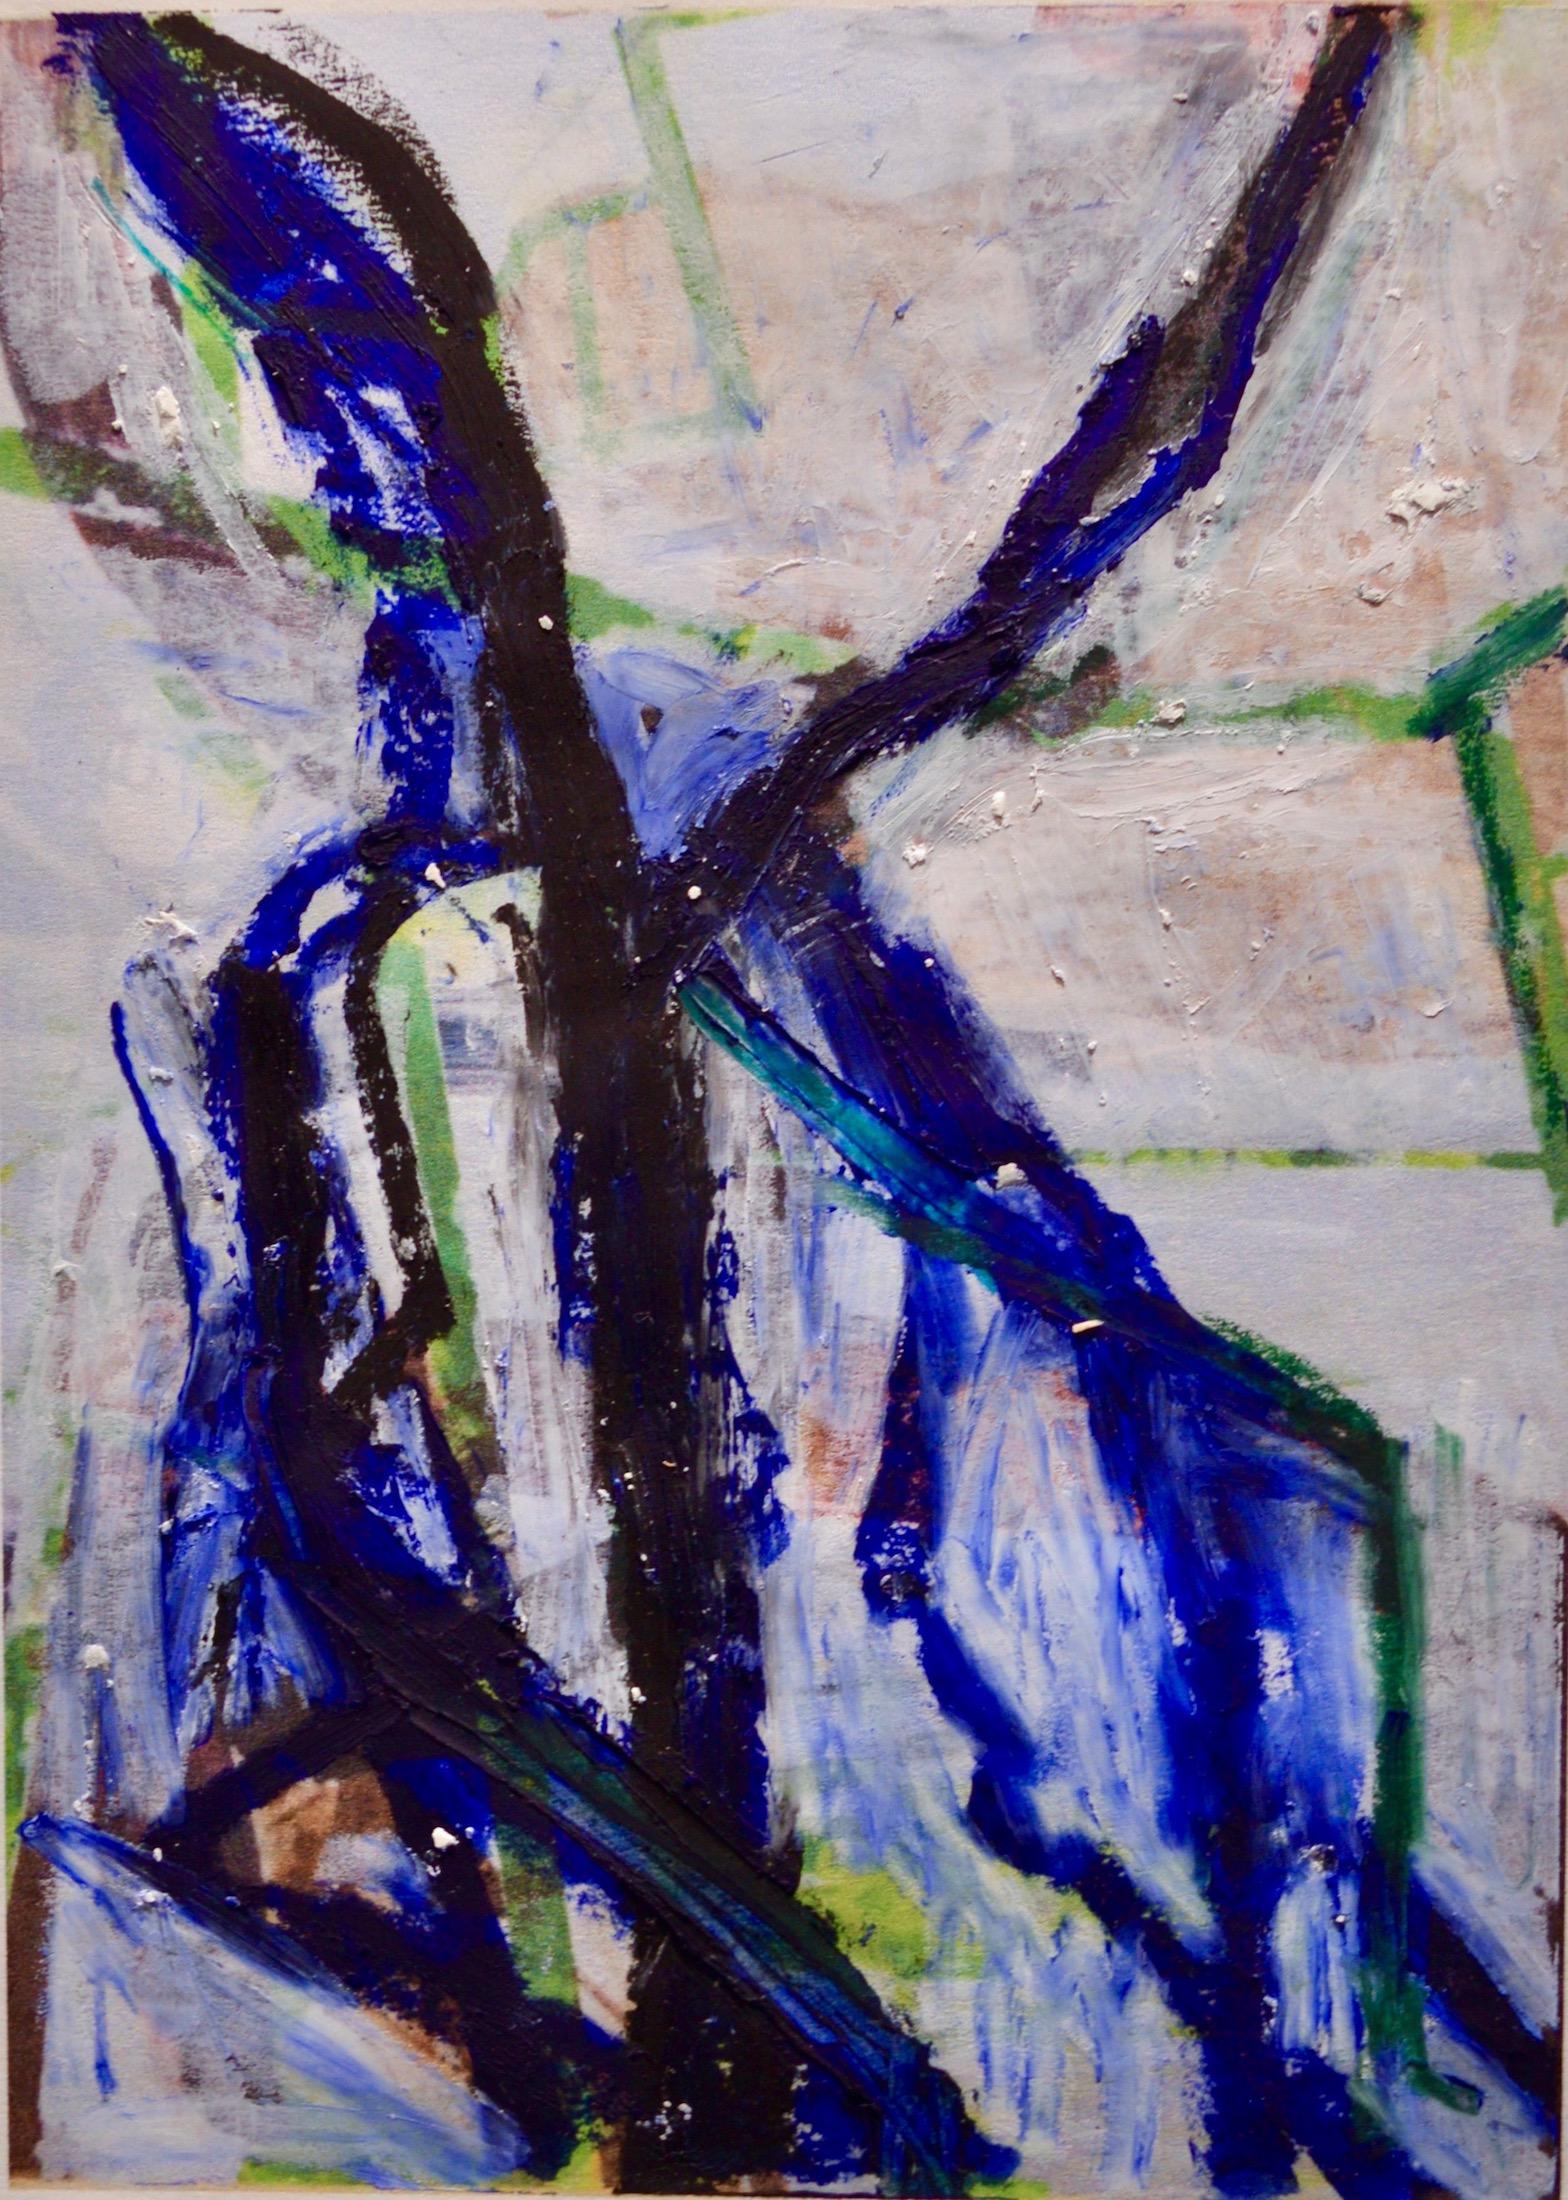 Trees & Vines 4